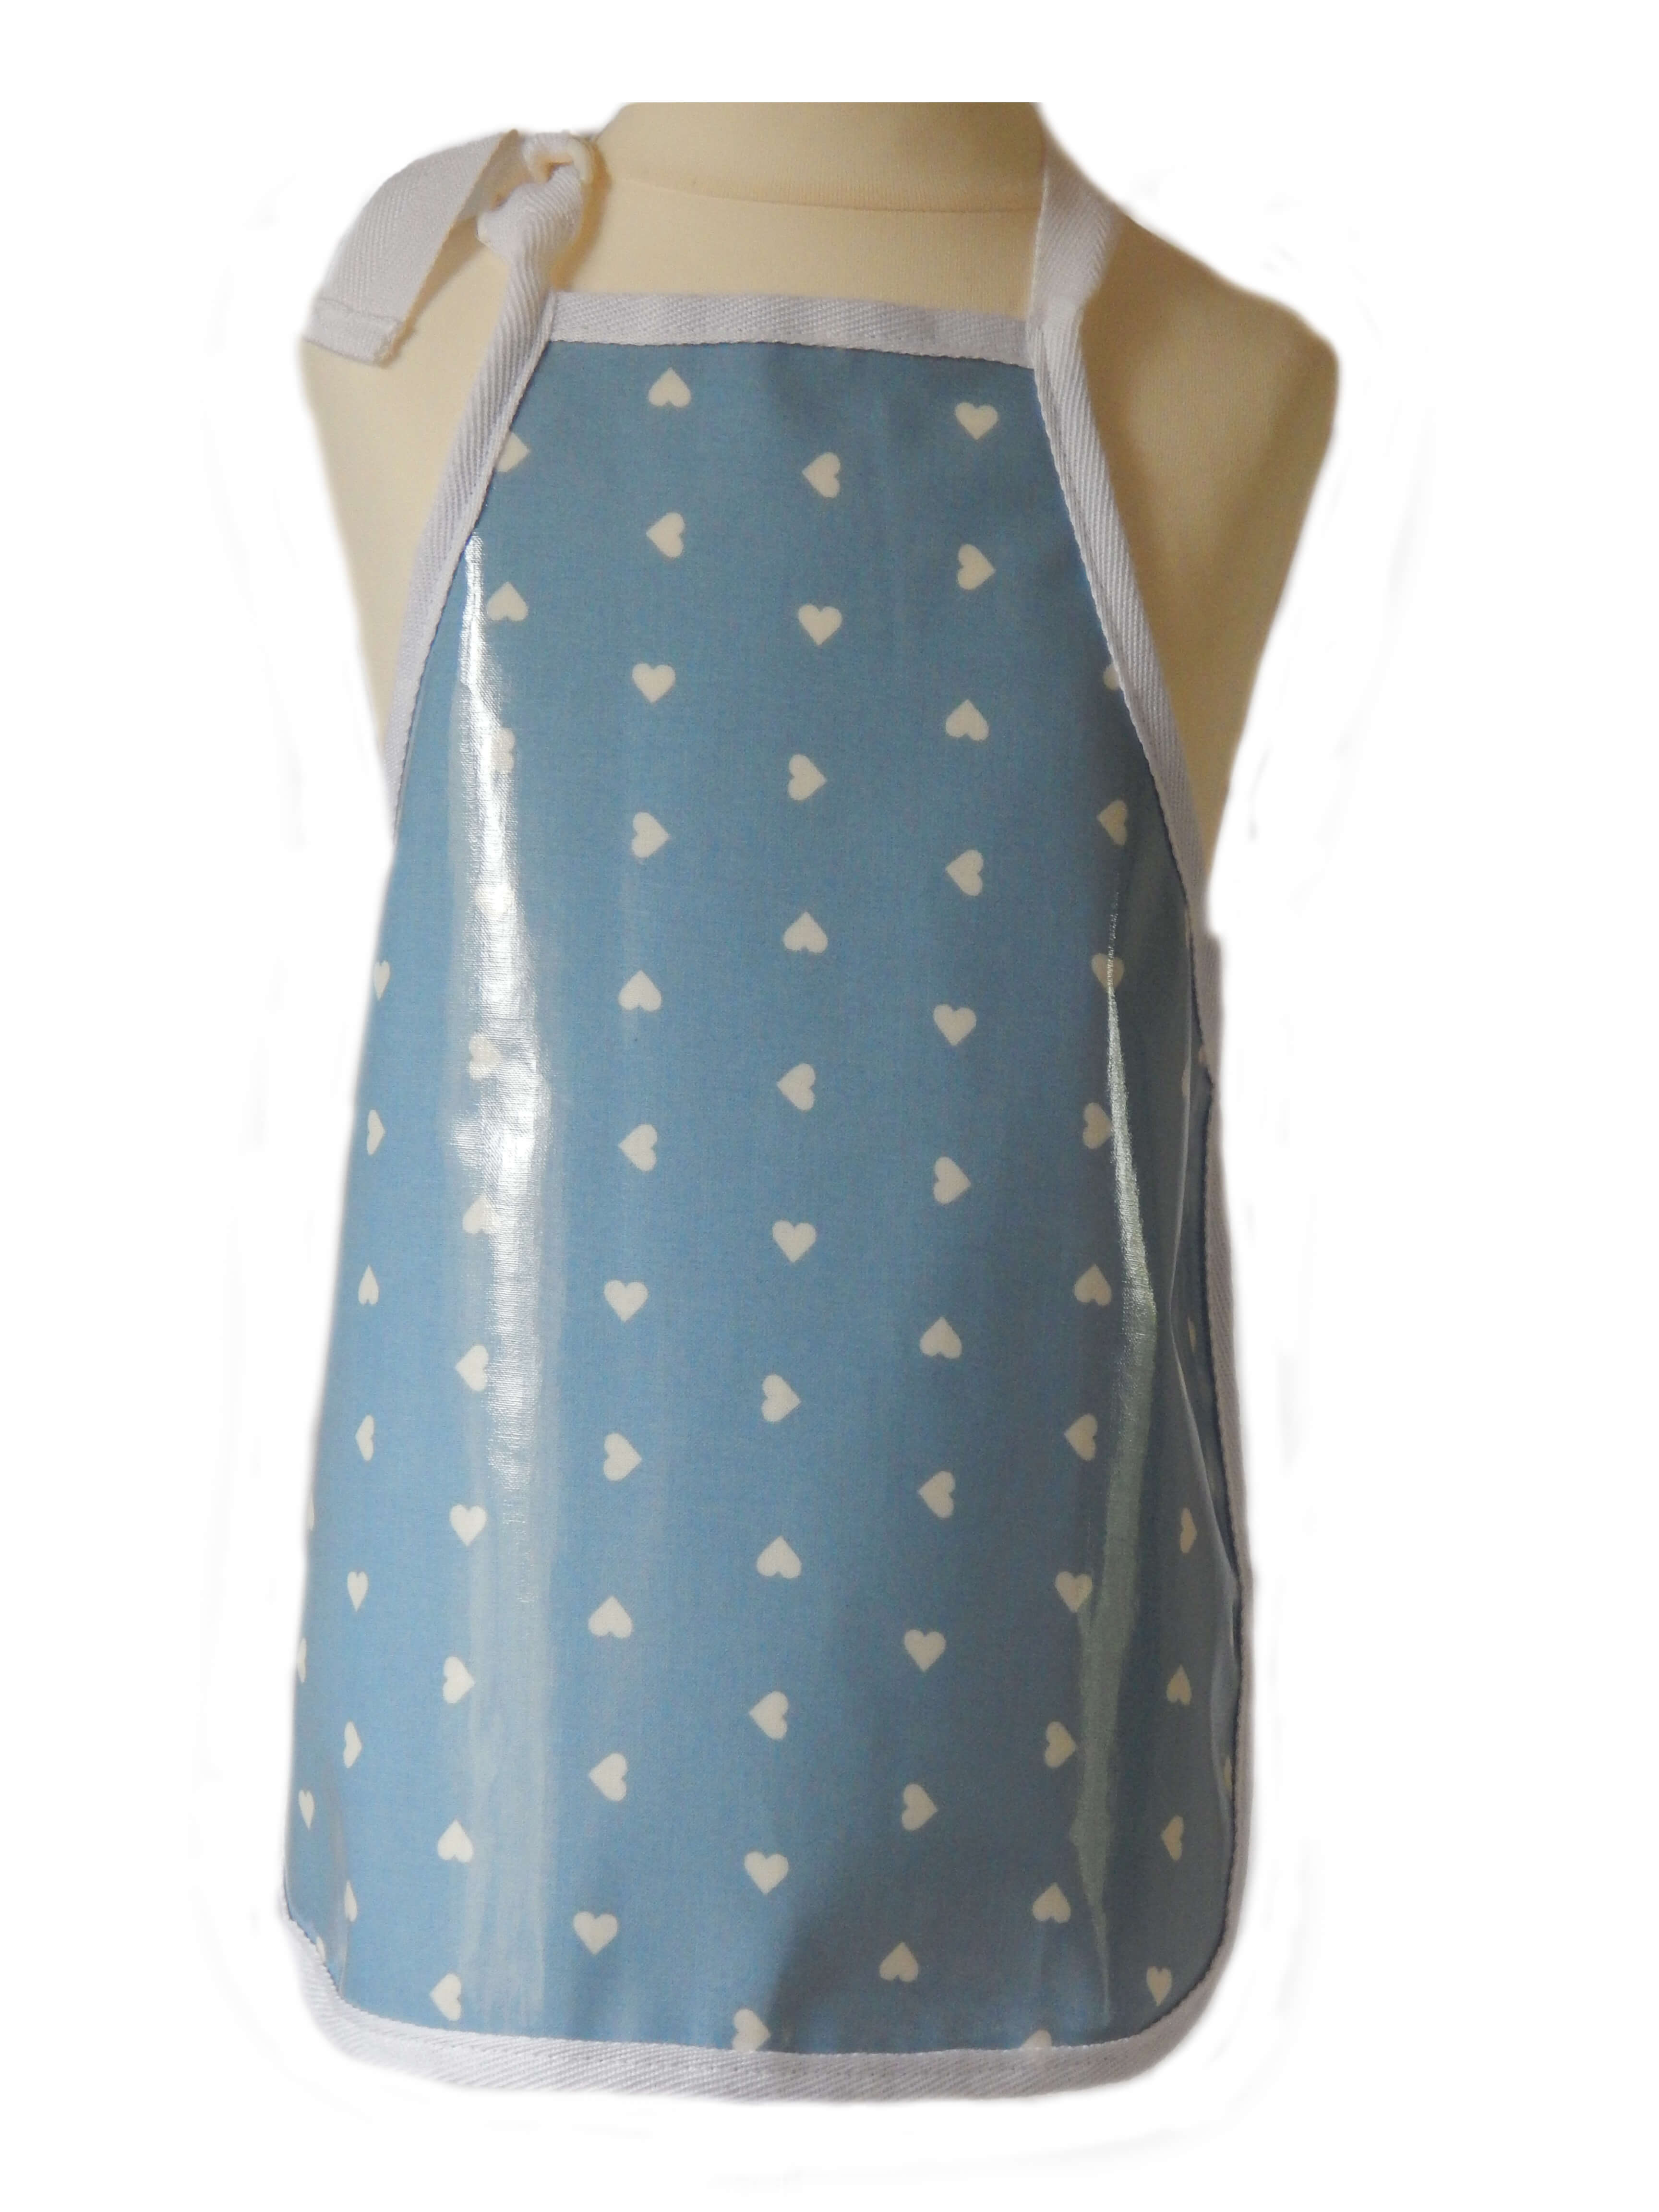 Kid's wipeable apron - White hearts design